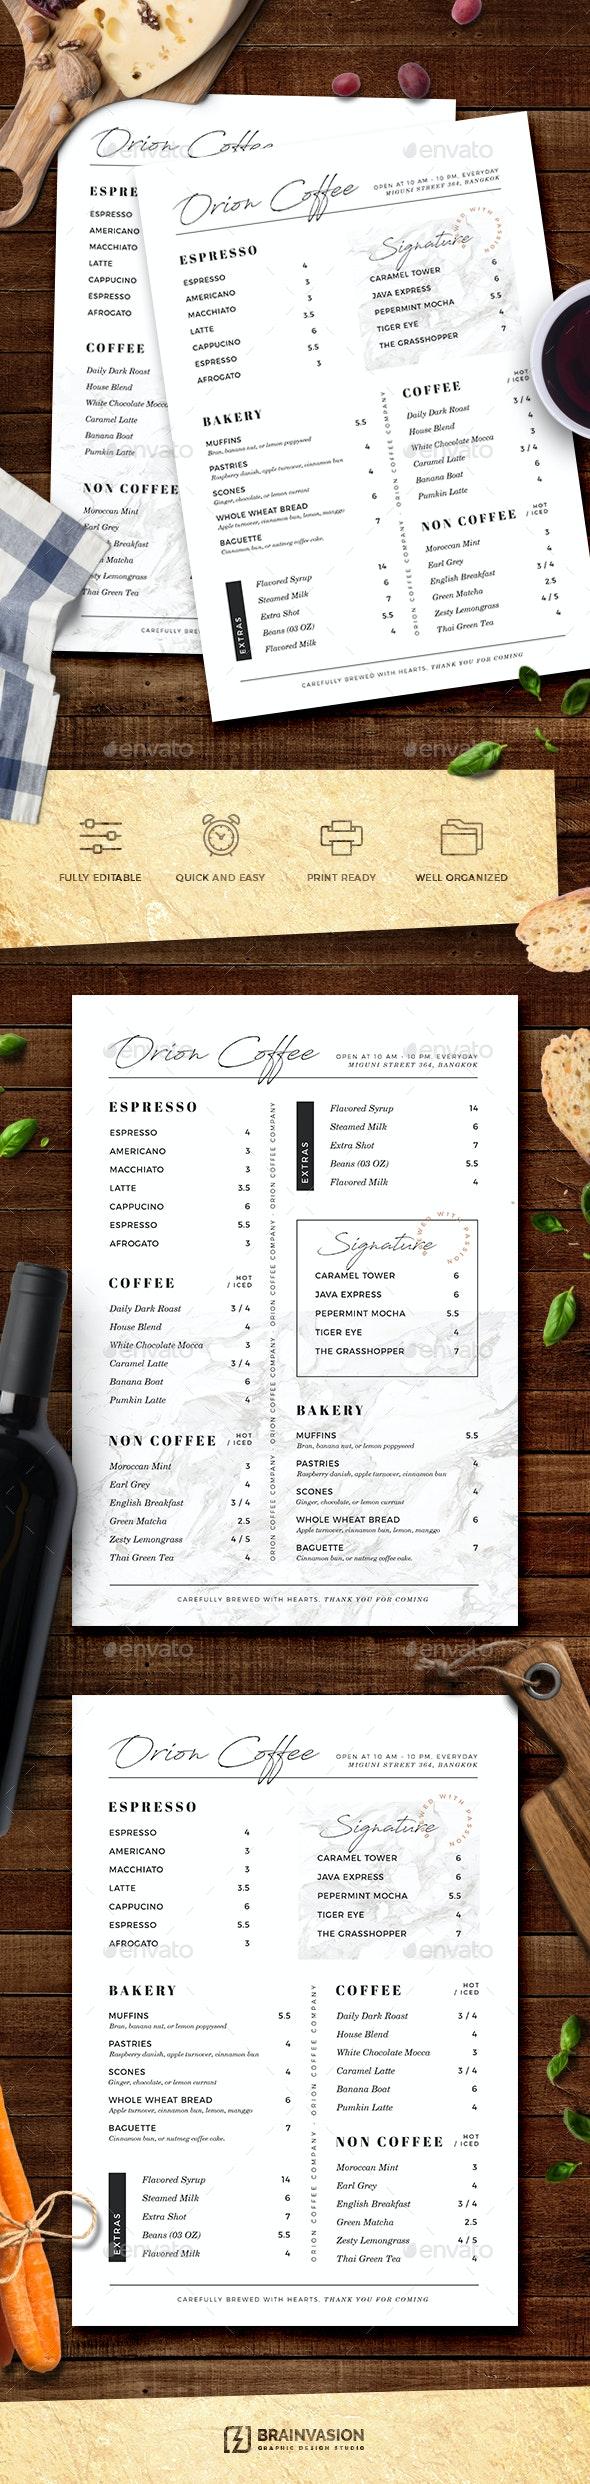 Cafe / Coffee Shop Menu Template - Food Menus Print Templates